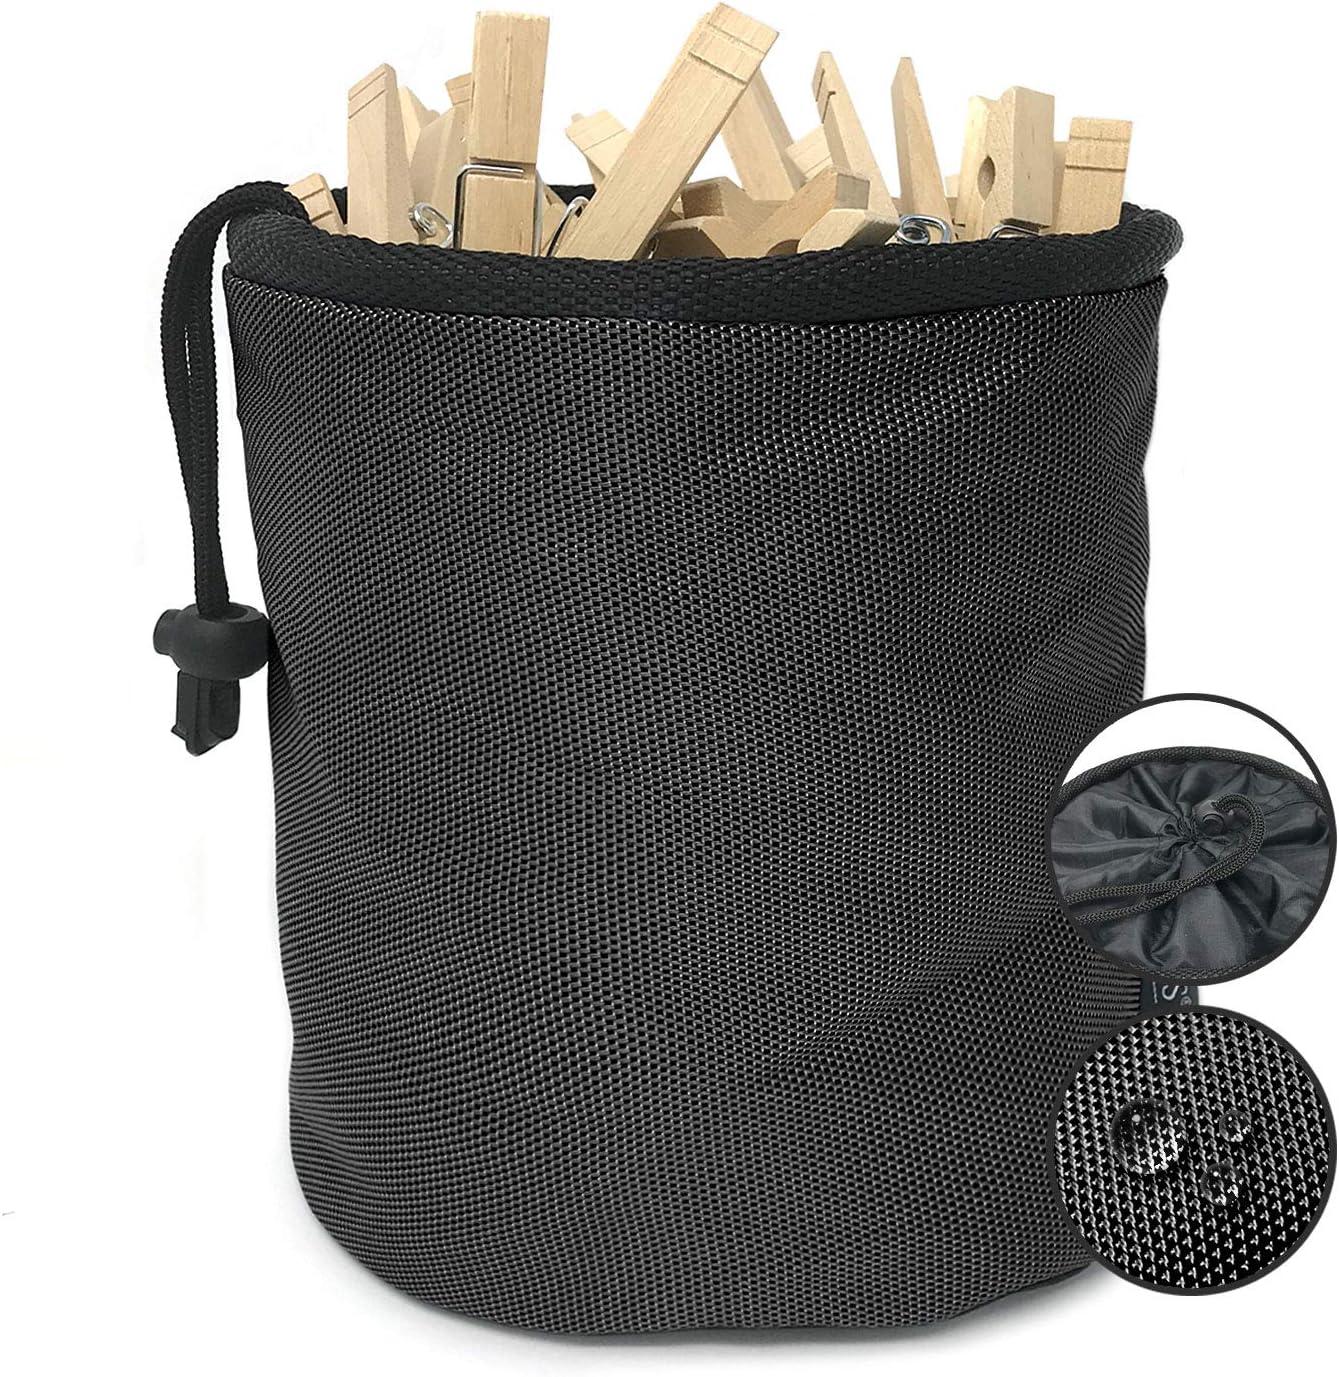 Bolsa para Pinzas Impermeable Premium de Smith con Mosquetones de Metal para Colgarla Negro